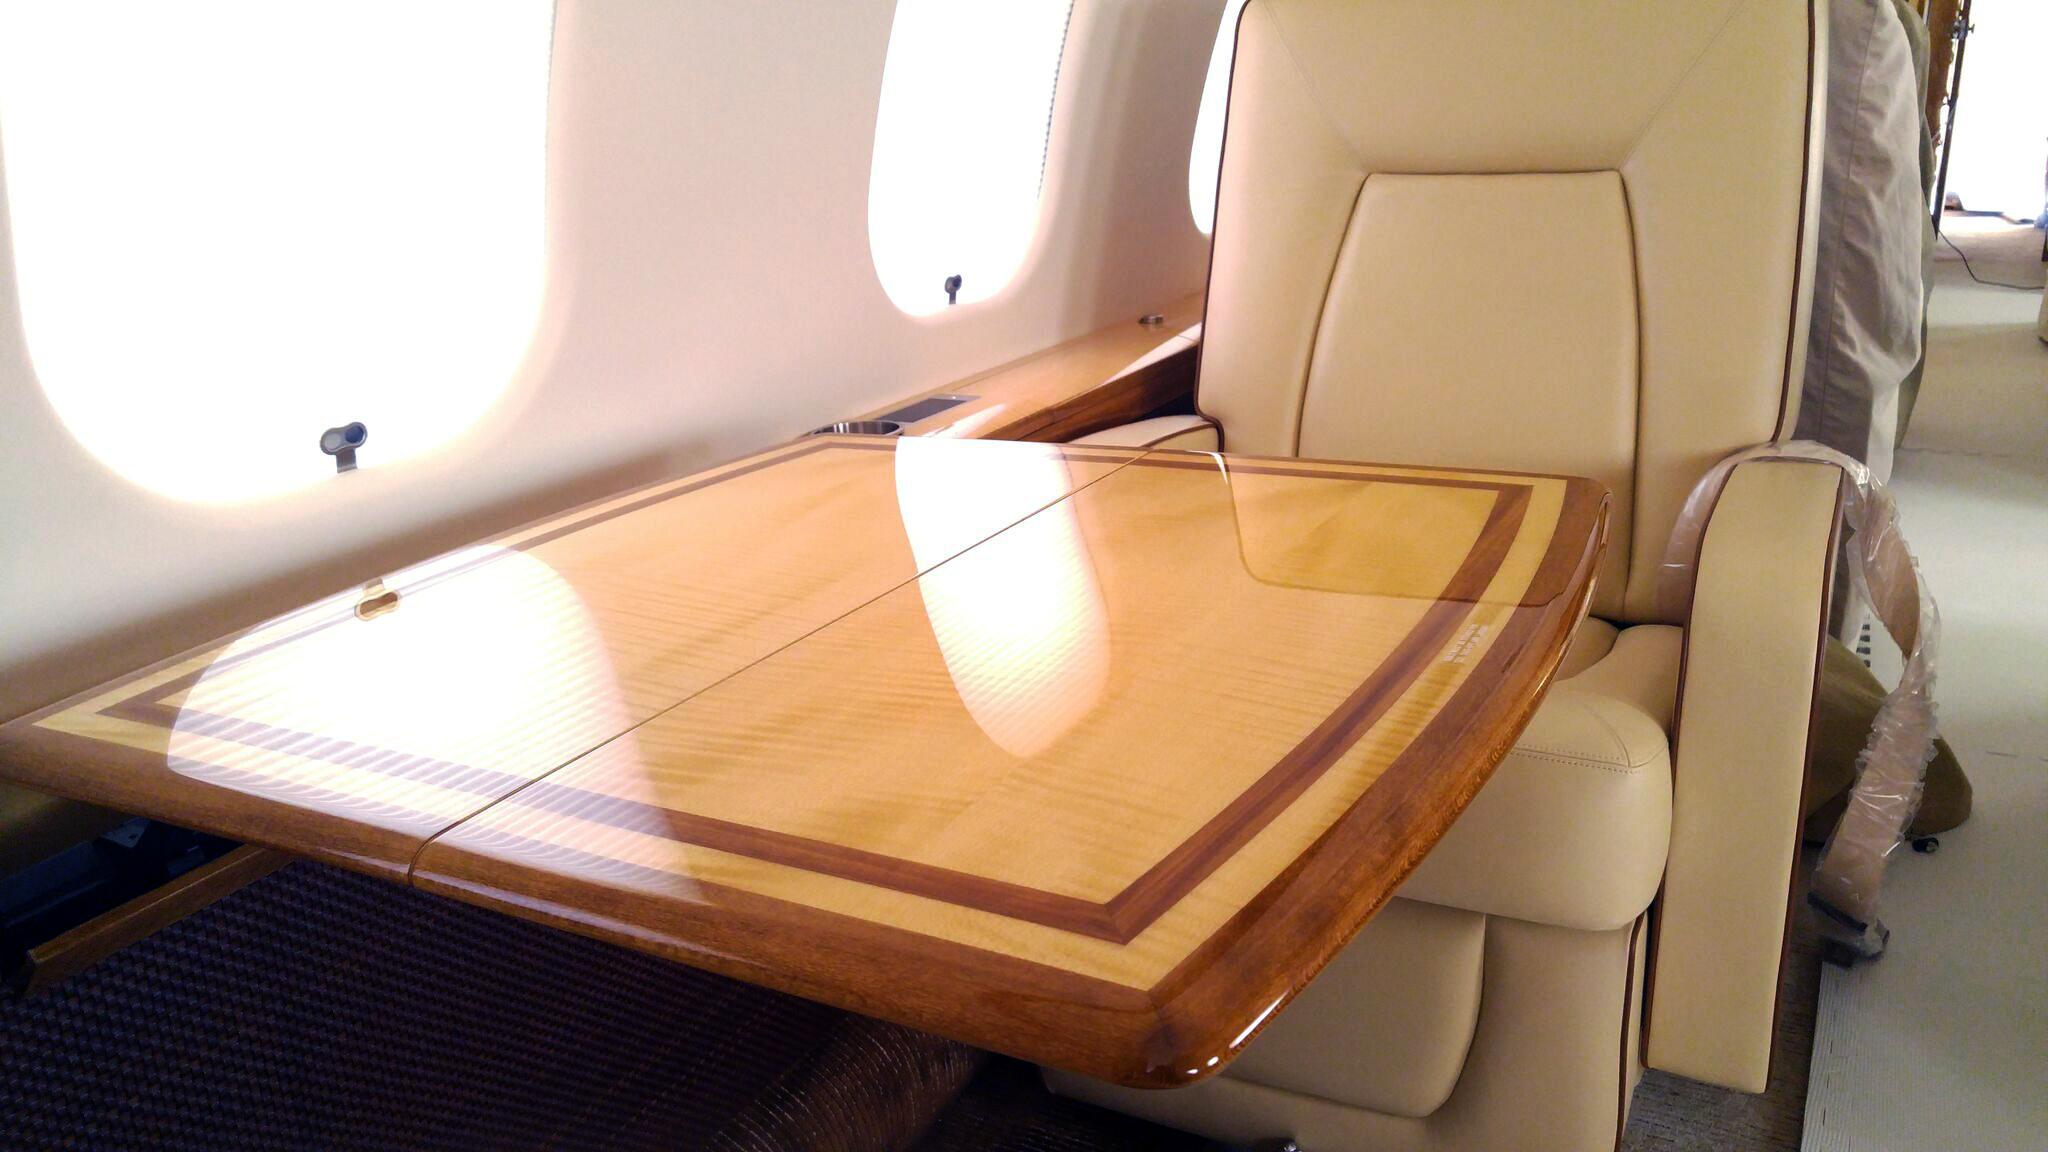 global seat and table.jpeg